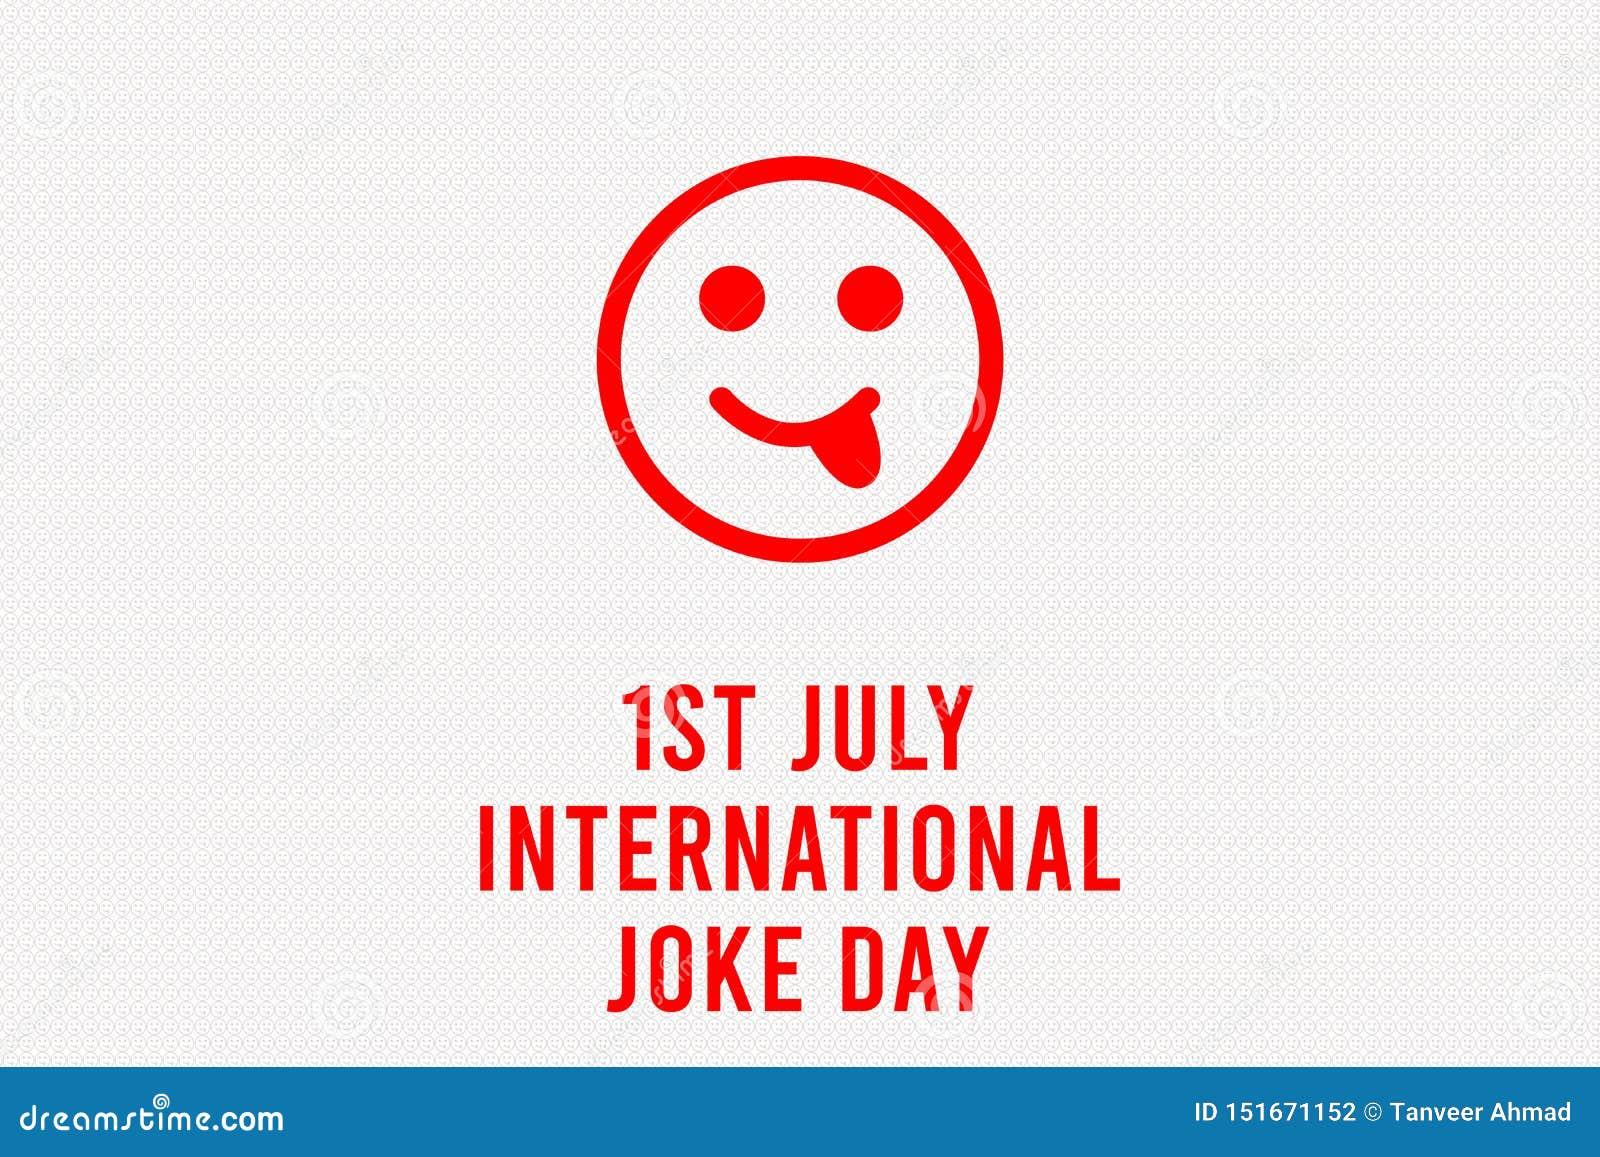 International Joke Day Background Illustration, Happy Yellow